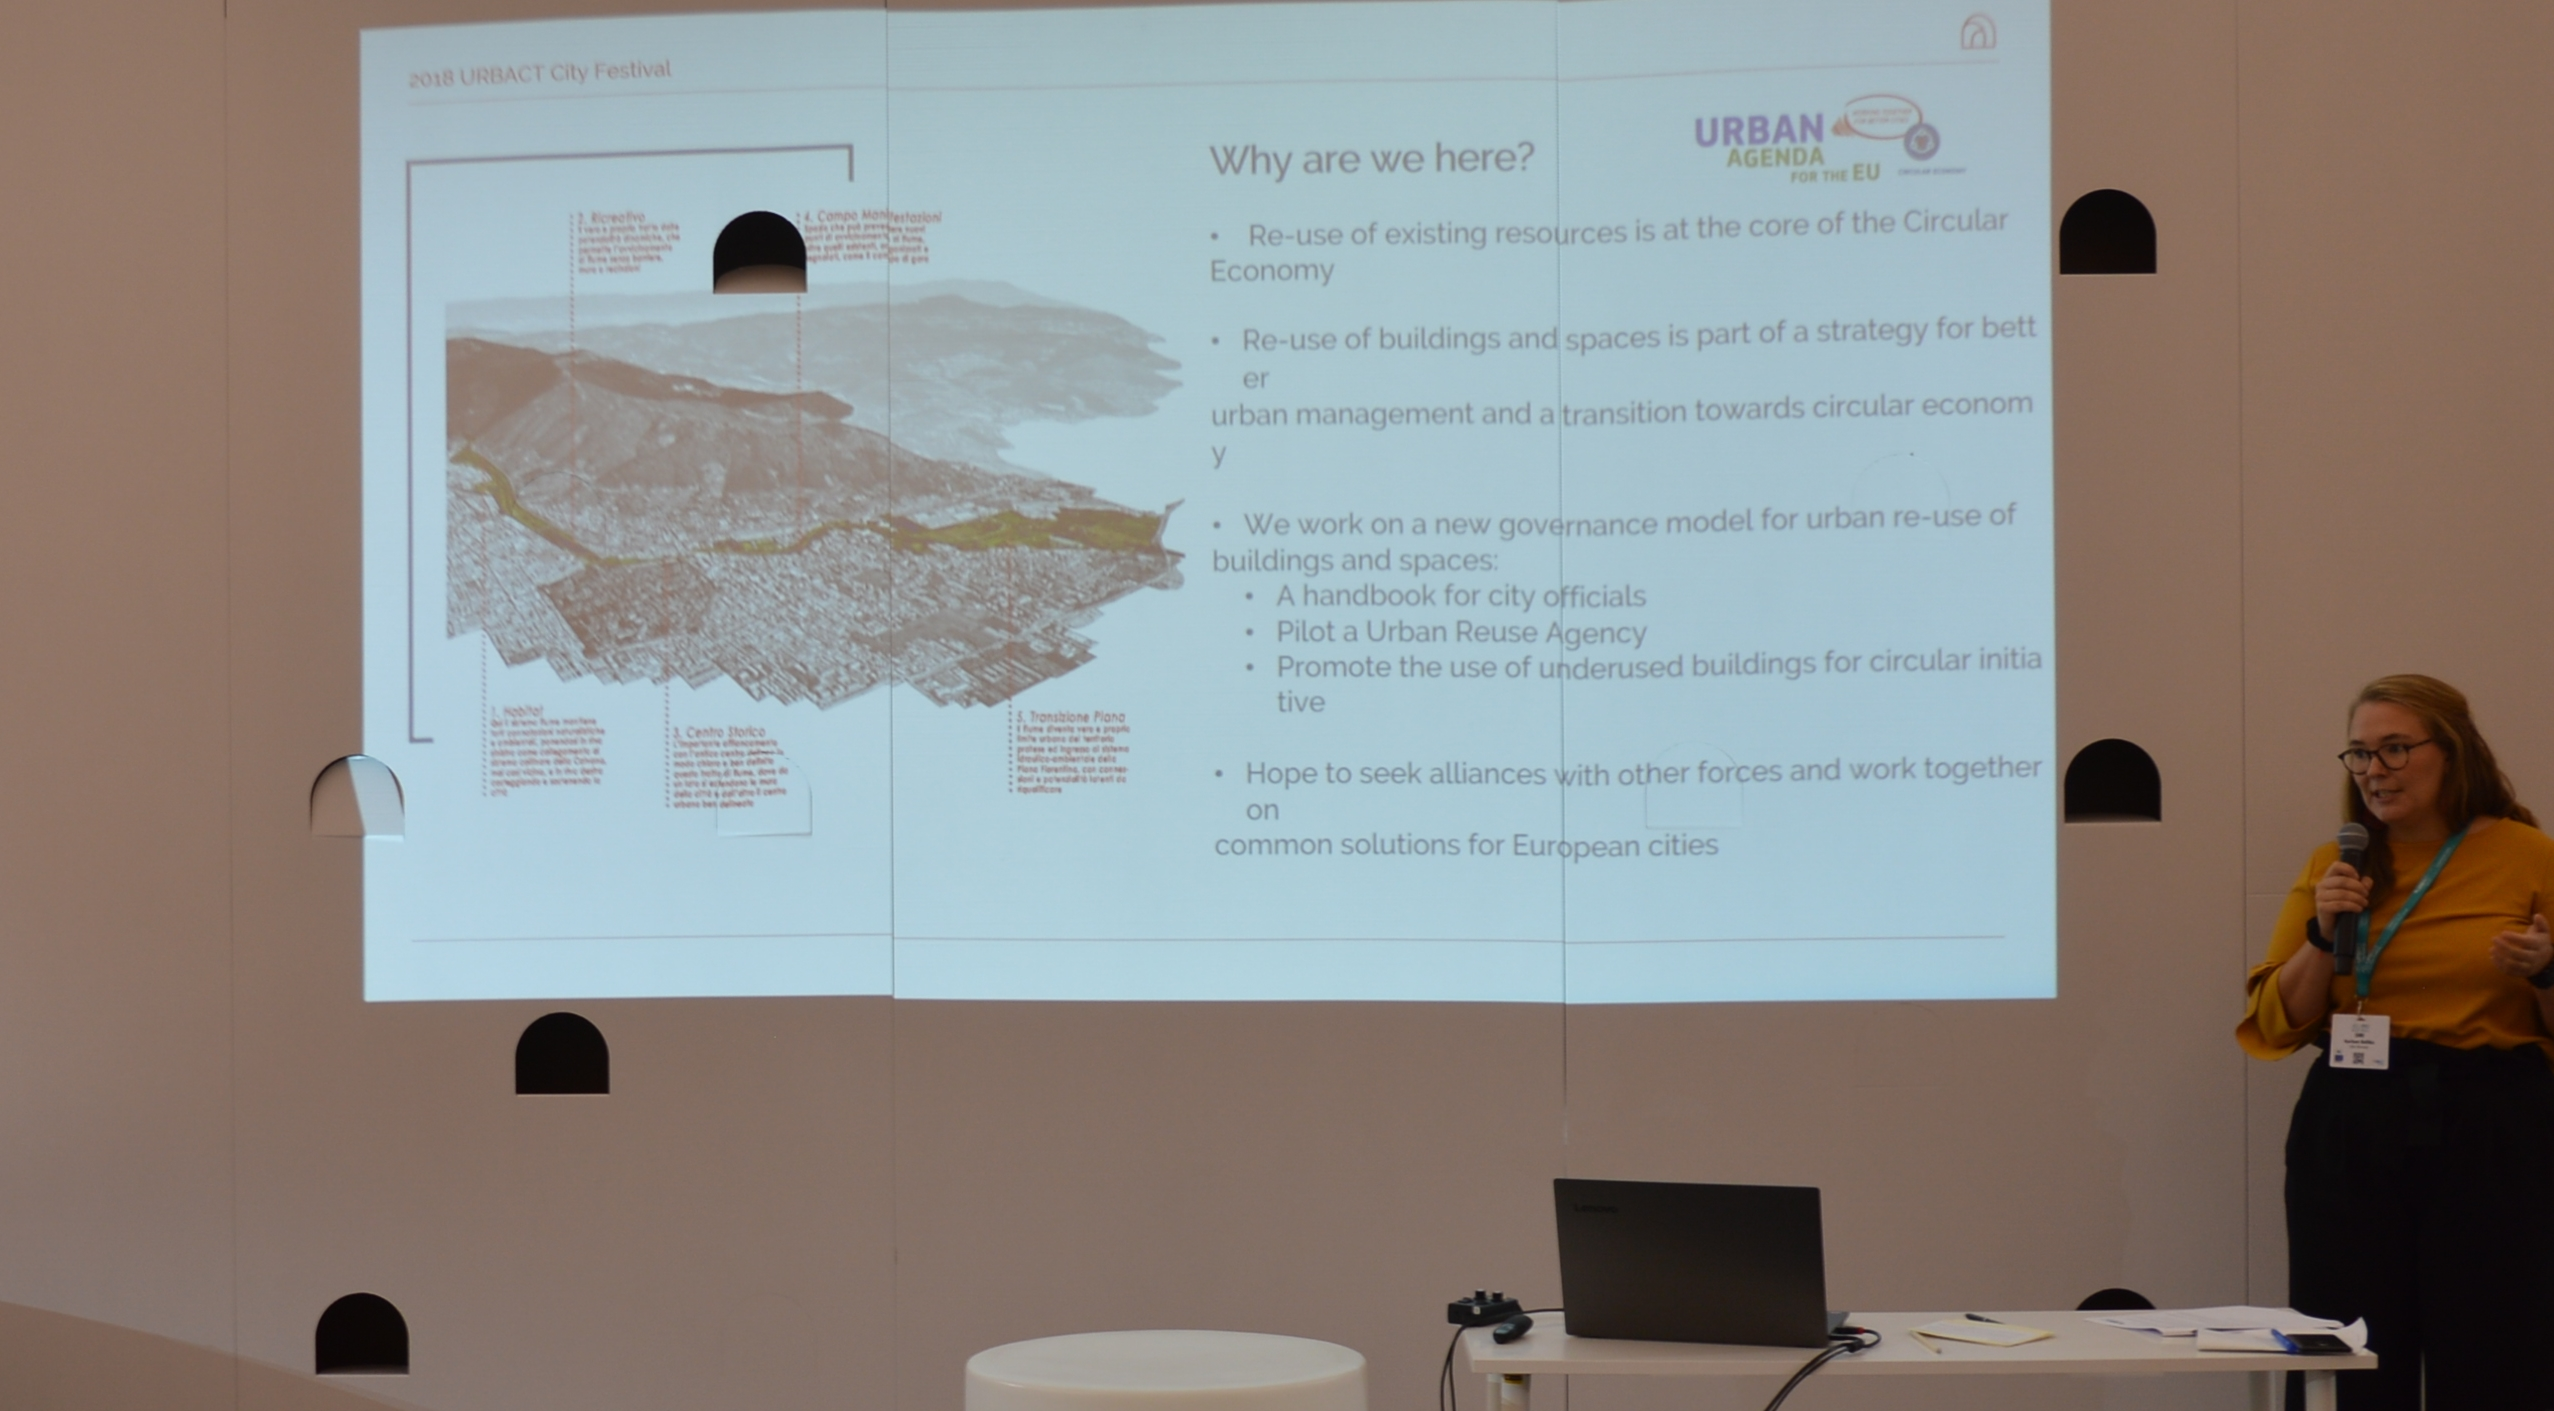 presentation of the Partnership on Circular Economy at Urbact City Festival 2018 in Lisbon